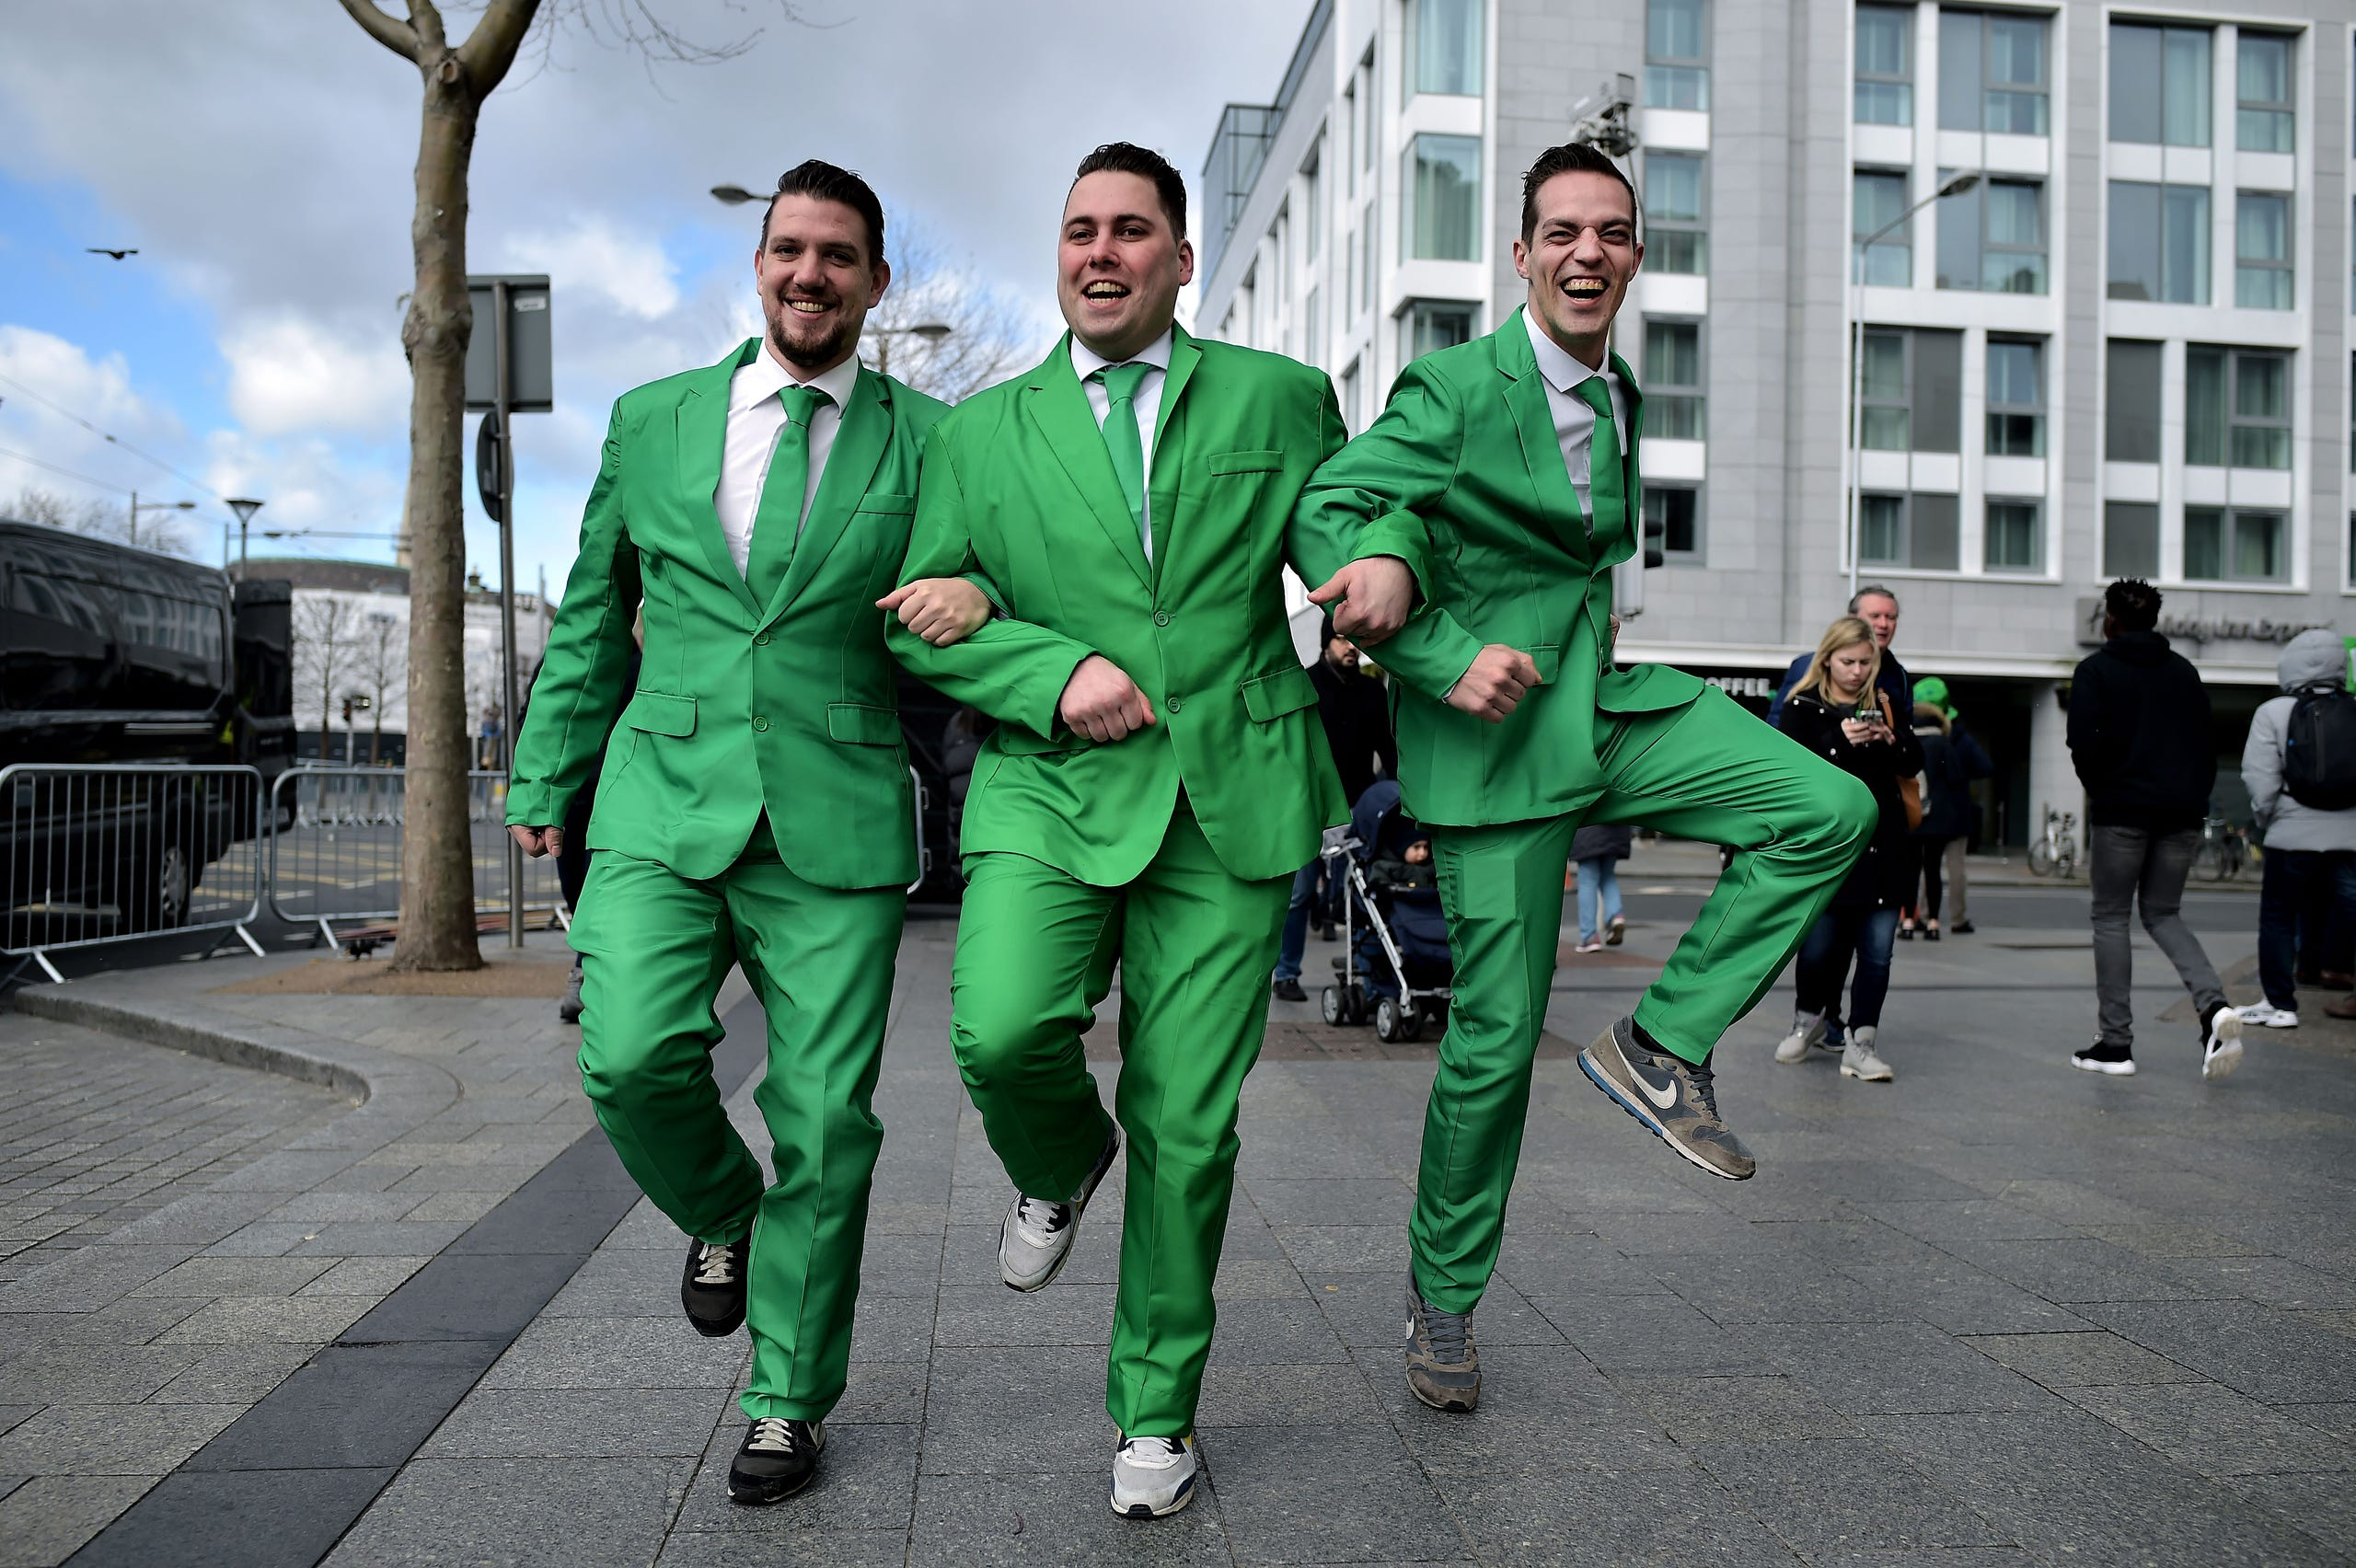 a95d02b2 Happy St. Patrick's Day!